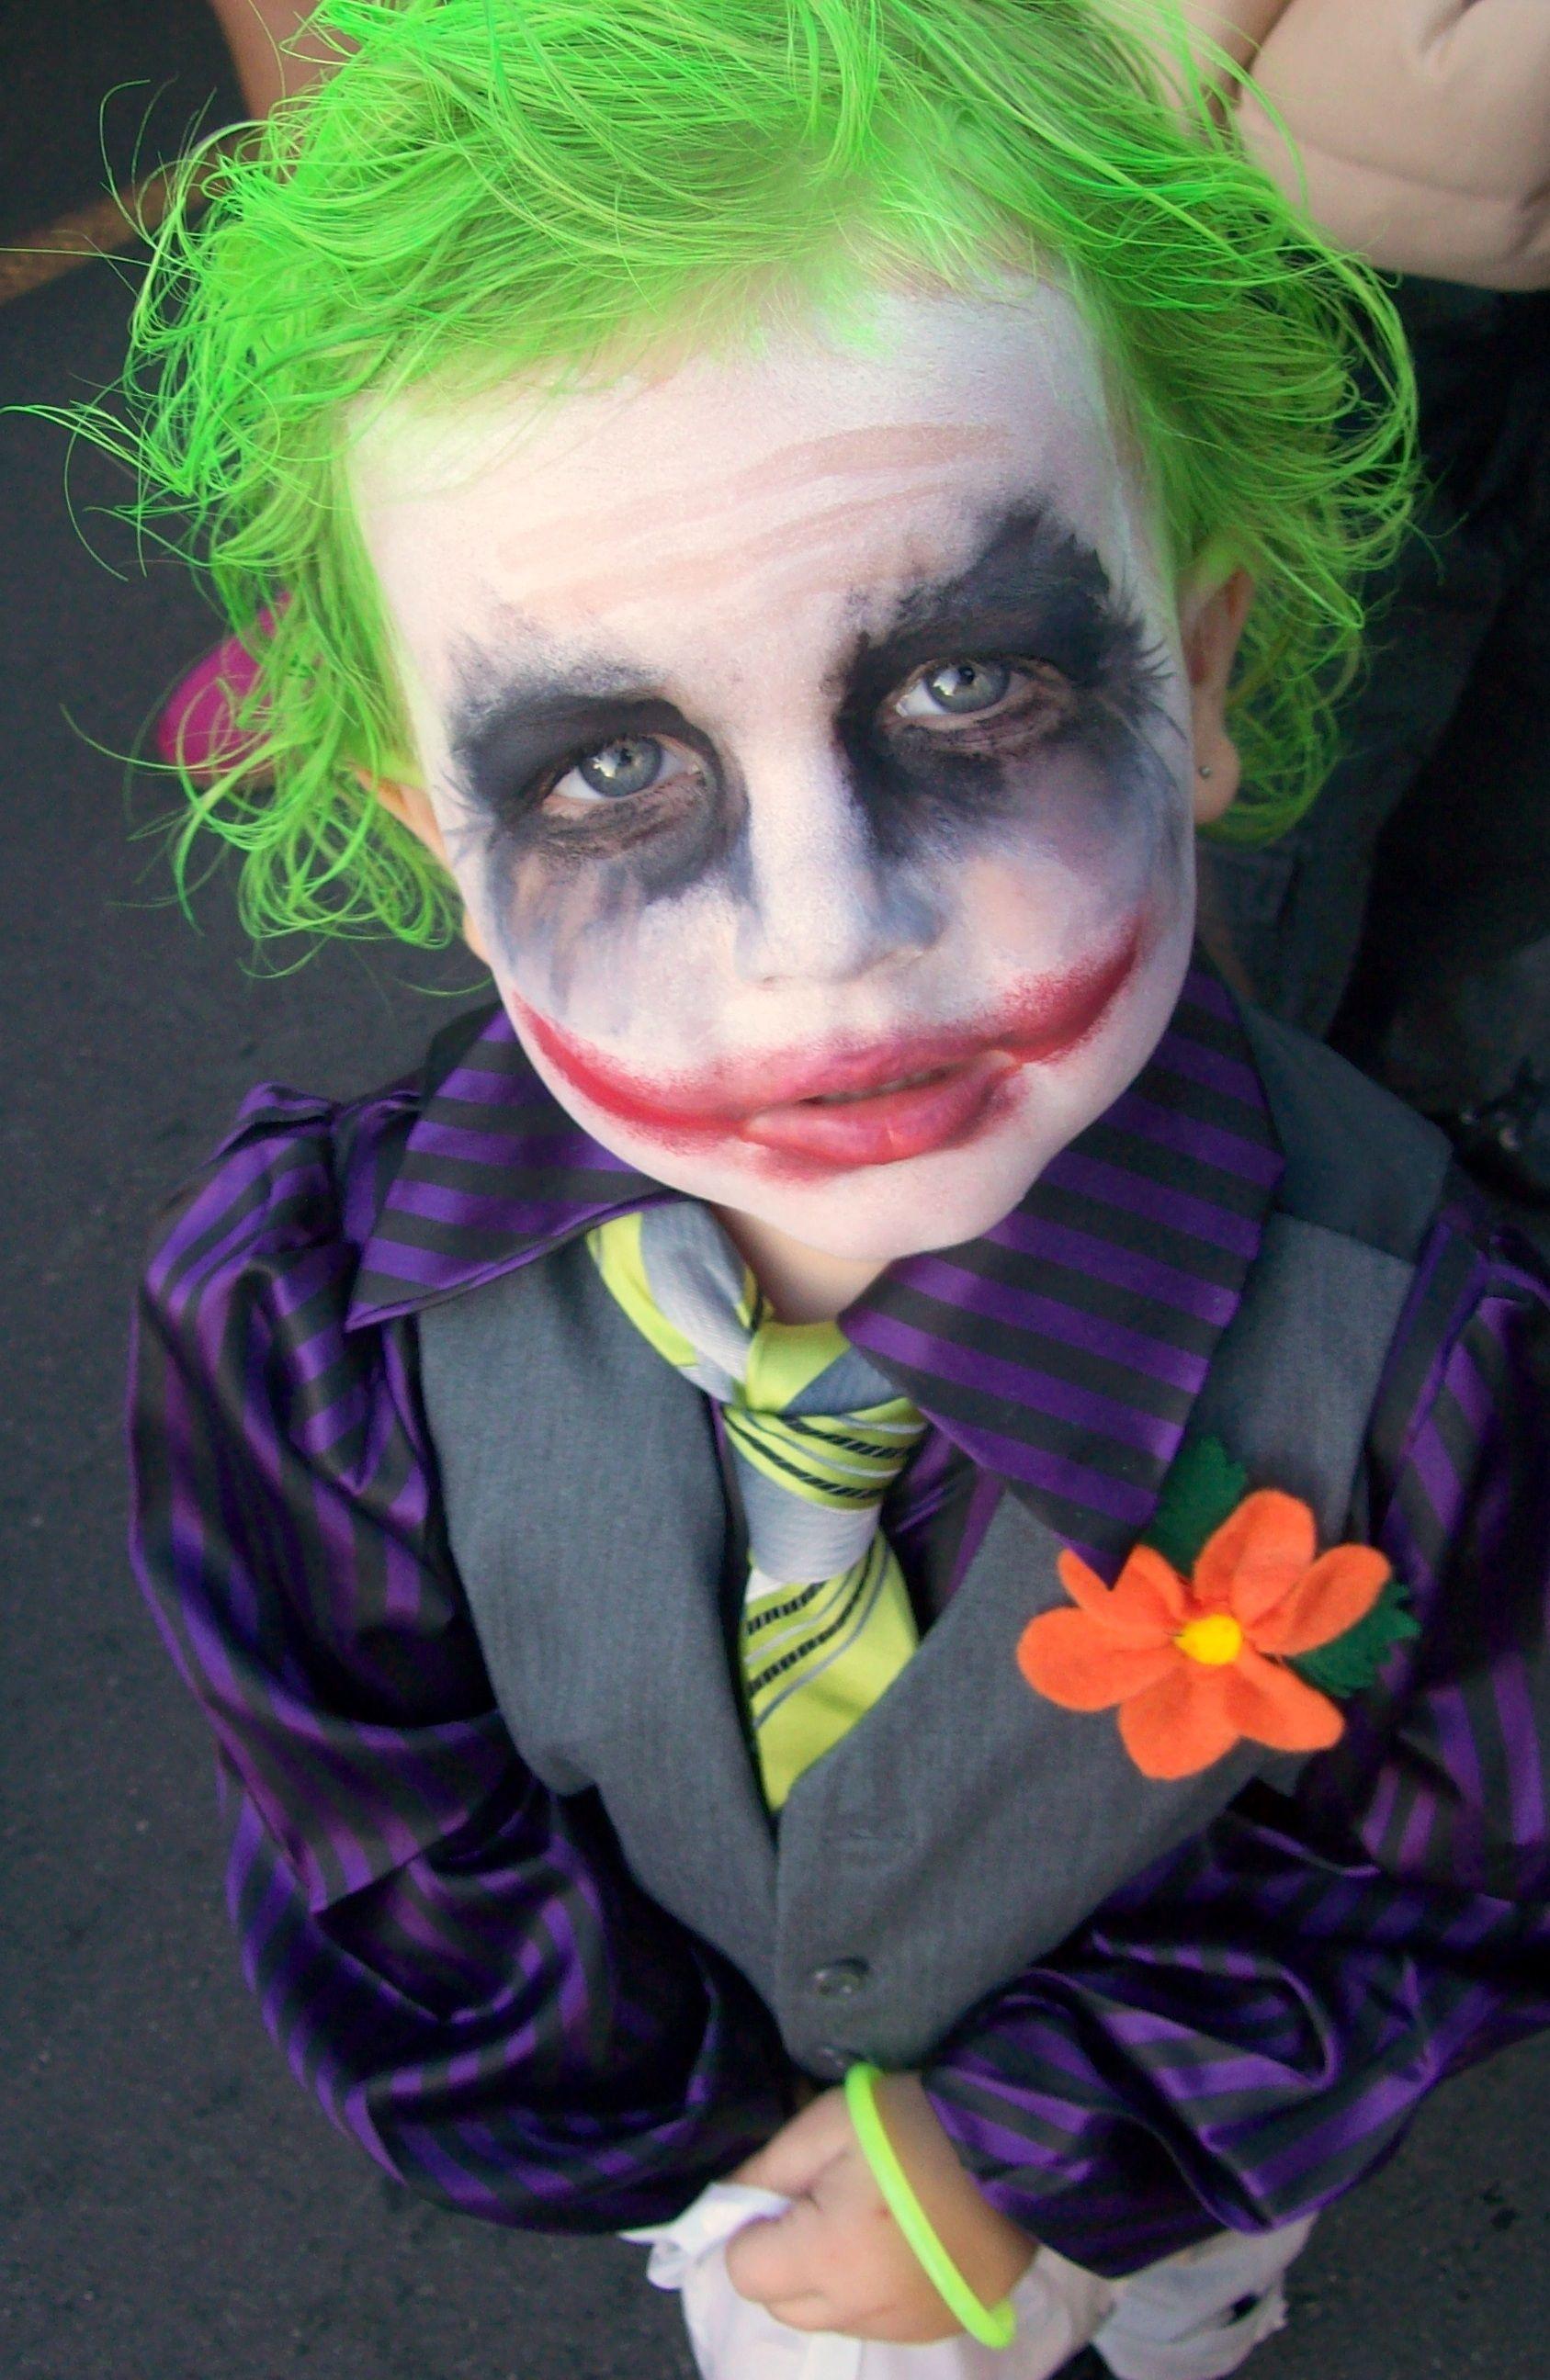 Kids Homemade Joker Costume Yup This Is My Nephew Halloween Boys Scary Kids Costumes Diy Halloween Costumes For Kids